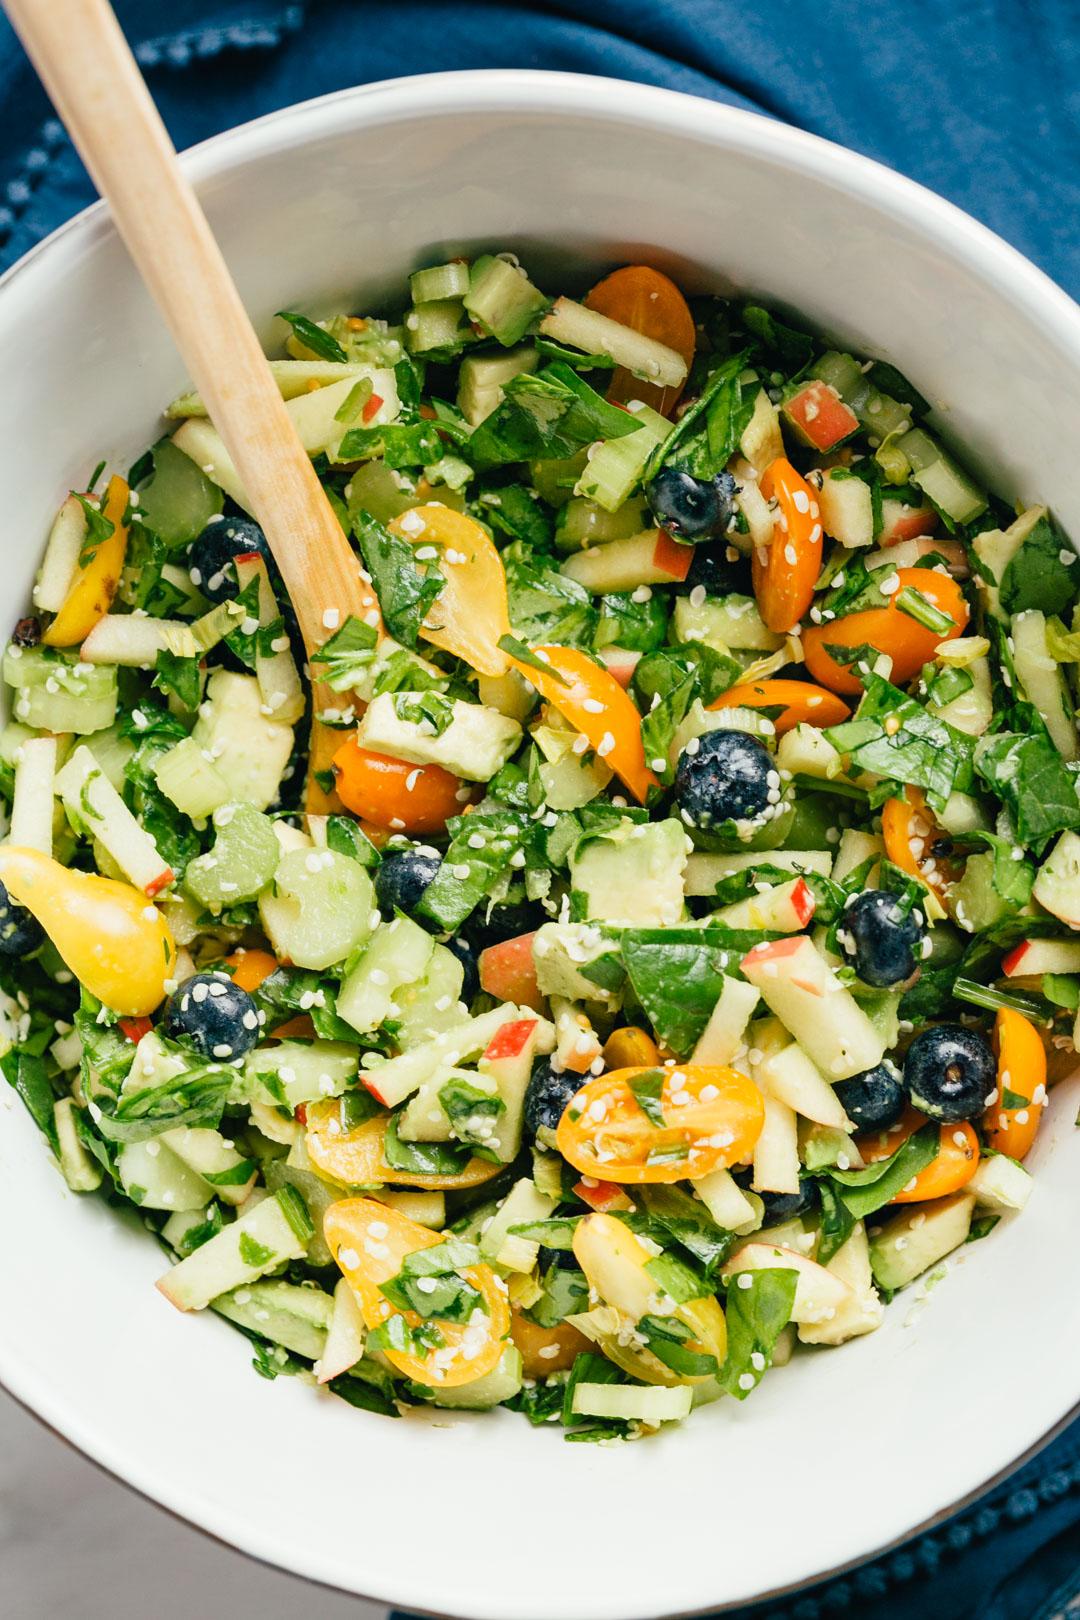 Detox-Salad-Emma-Ryan-4274.jpg